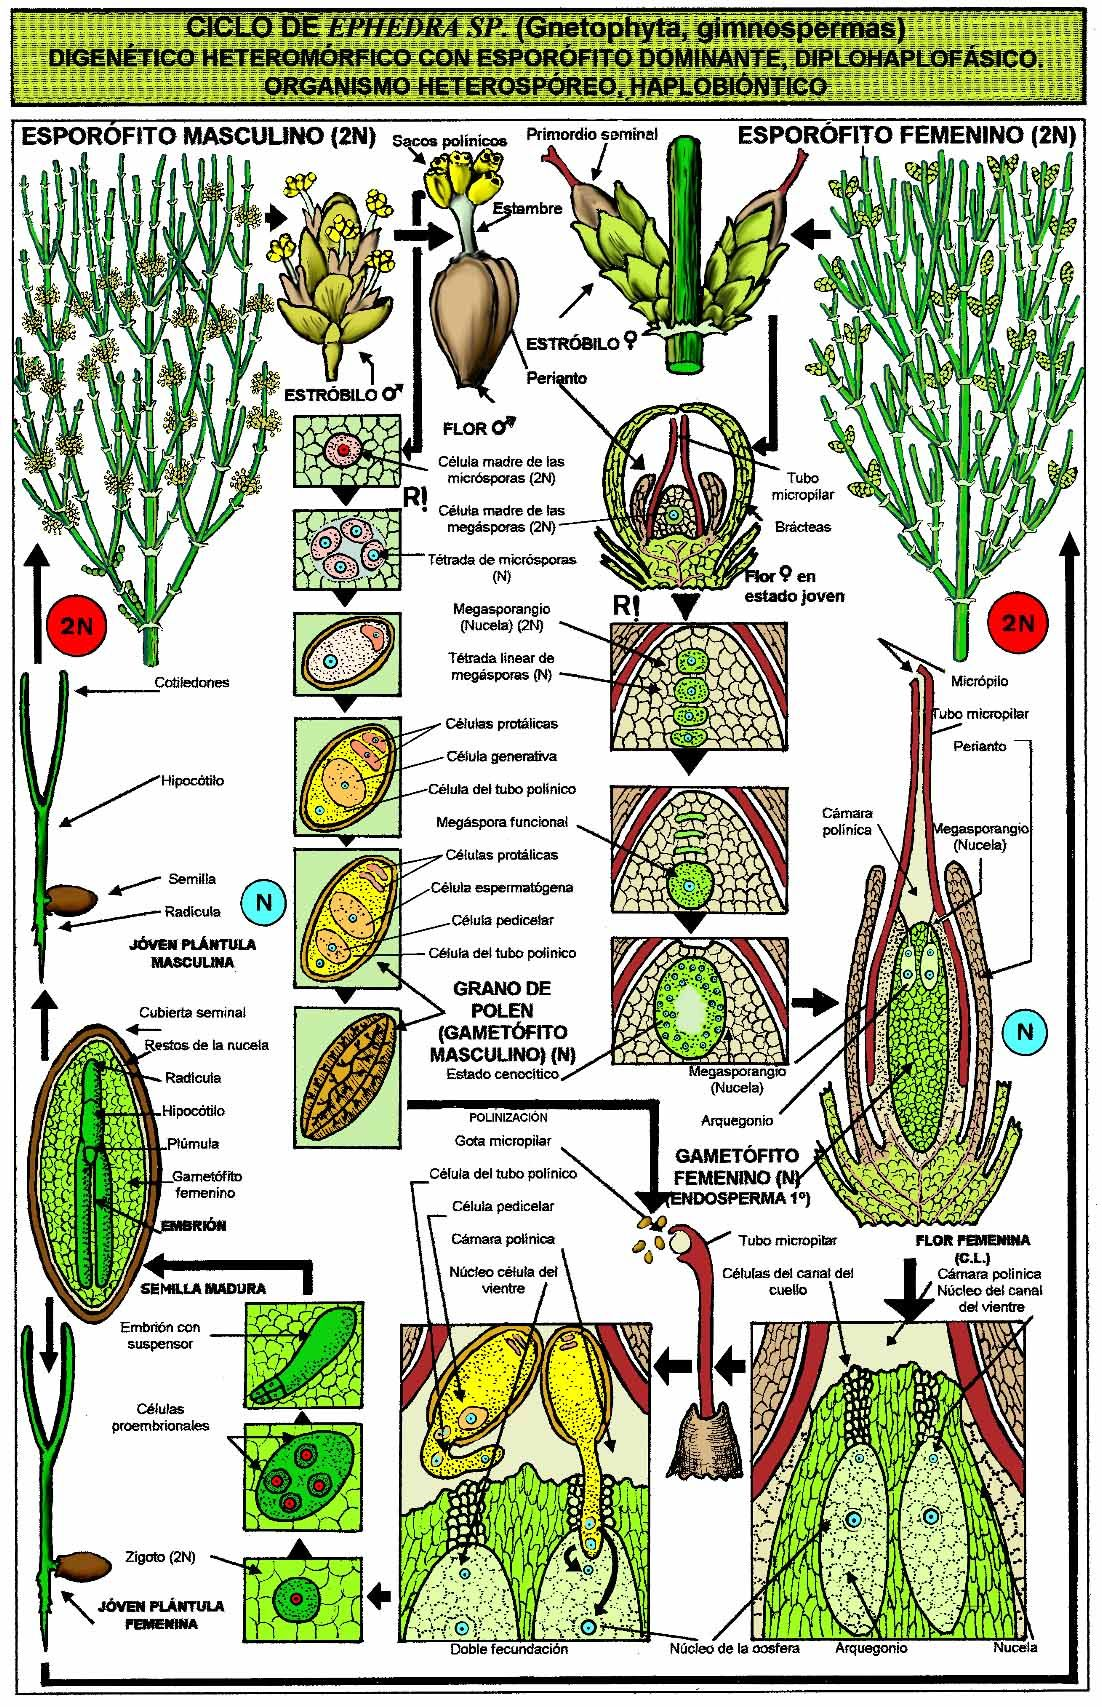 horsetail plant diagram electrical wiring diagrams 2 way switch ephedra sp gnetophyta jpg 11021707 ciclos de vida